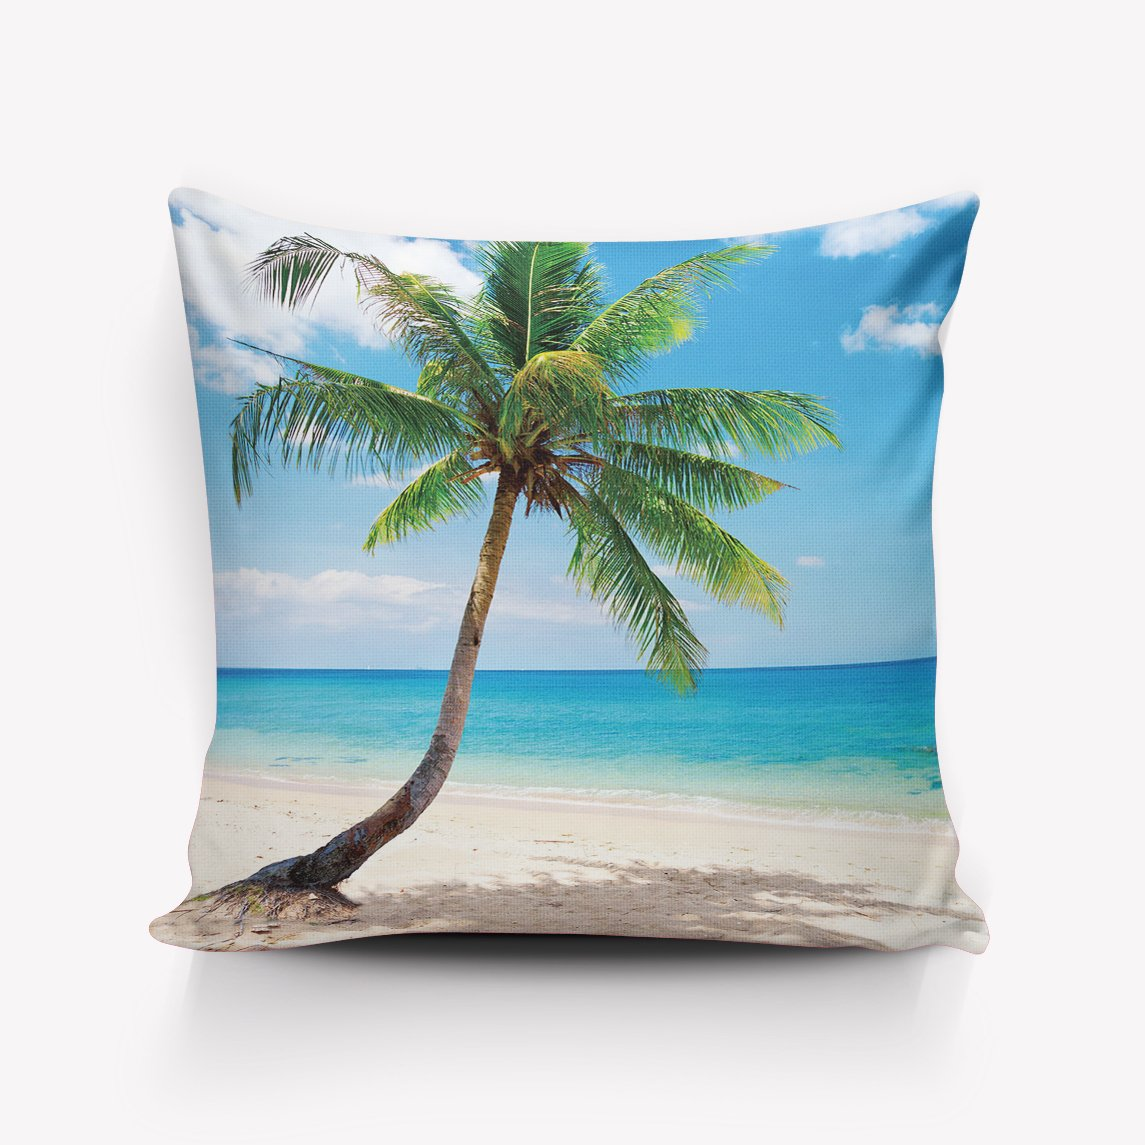 URDER Throw Pillowcase Covers/Euro Sham/Cushion Sham with Zipper, Luxury Linen Square Pillow Cases for Sofa/Bed/Chair Decor, Tropical Beach Coconut Tree - 18''x18'' by URDER